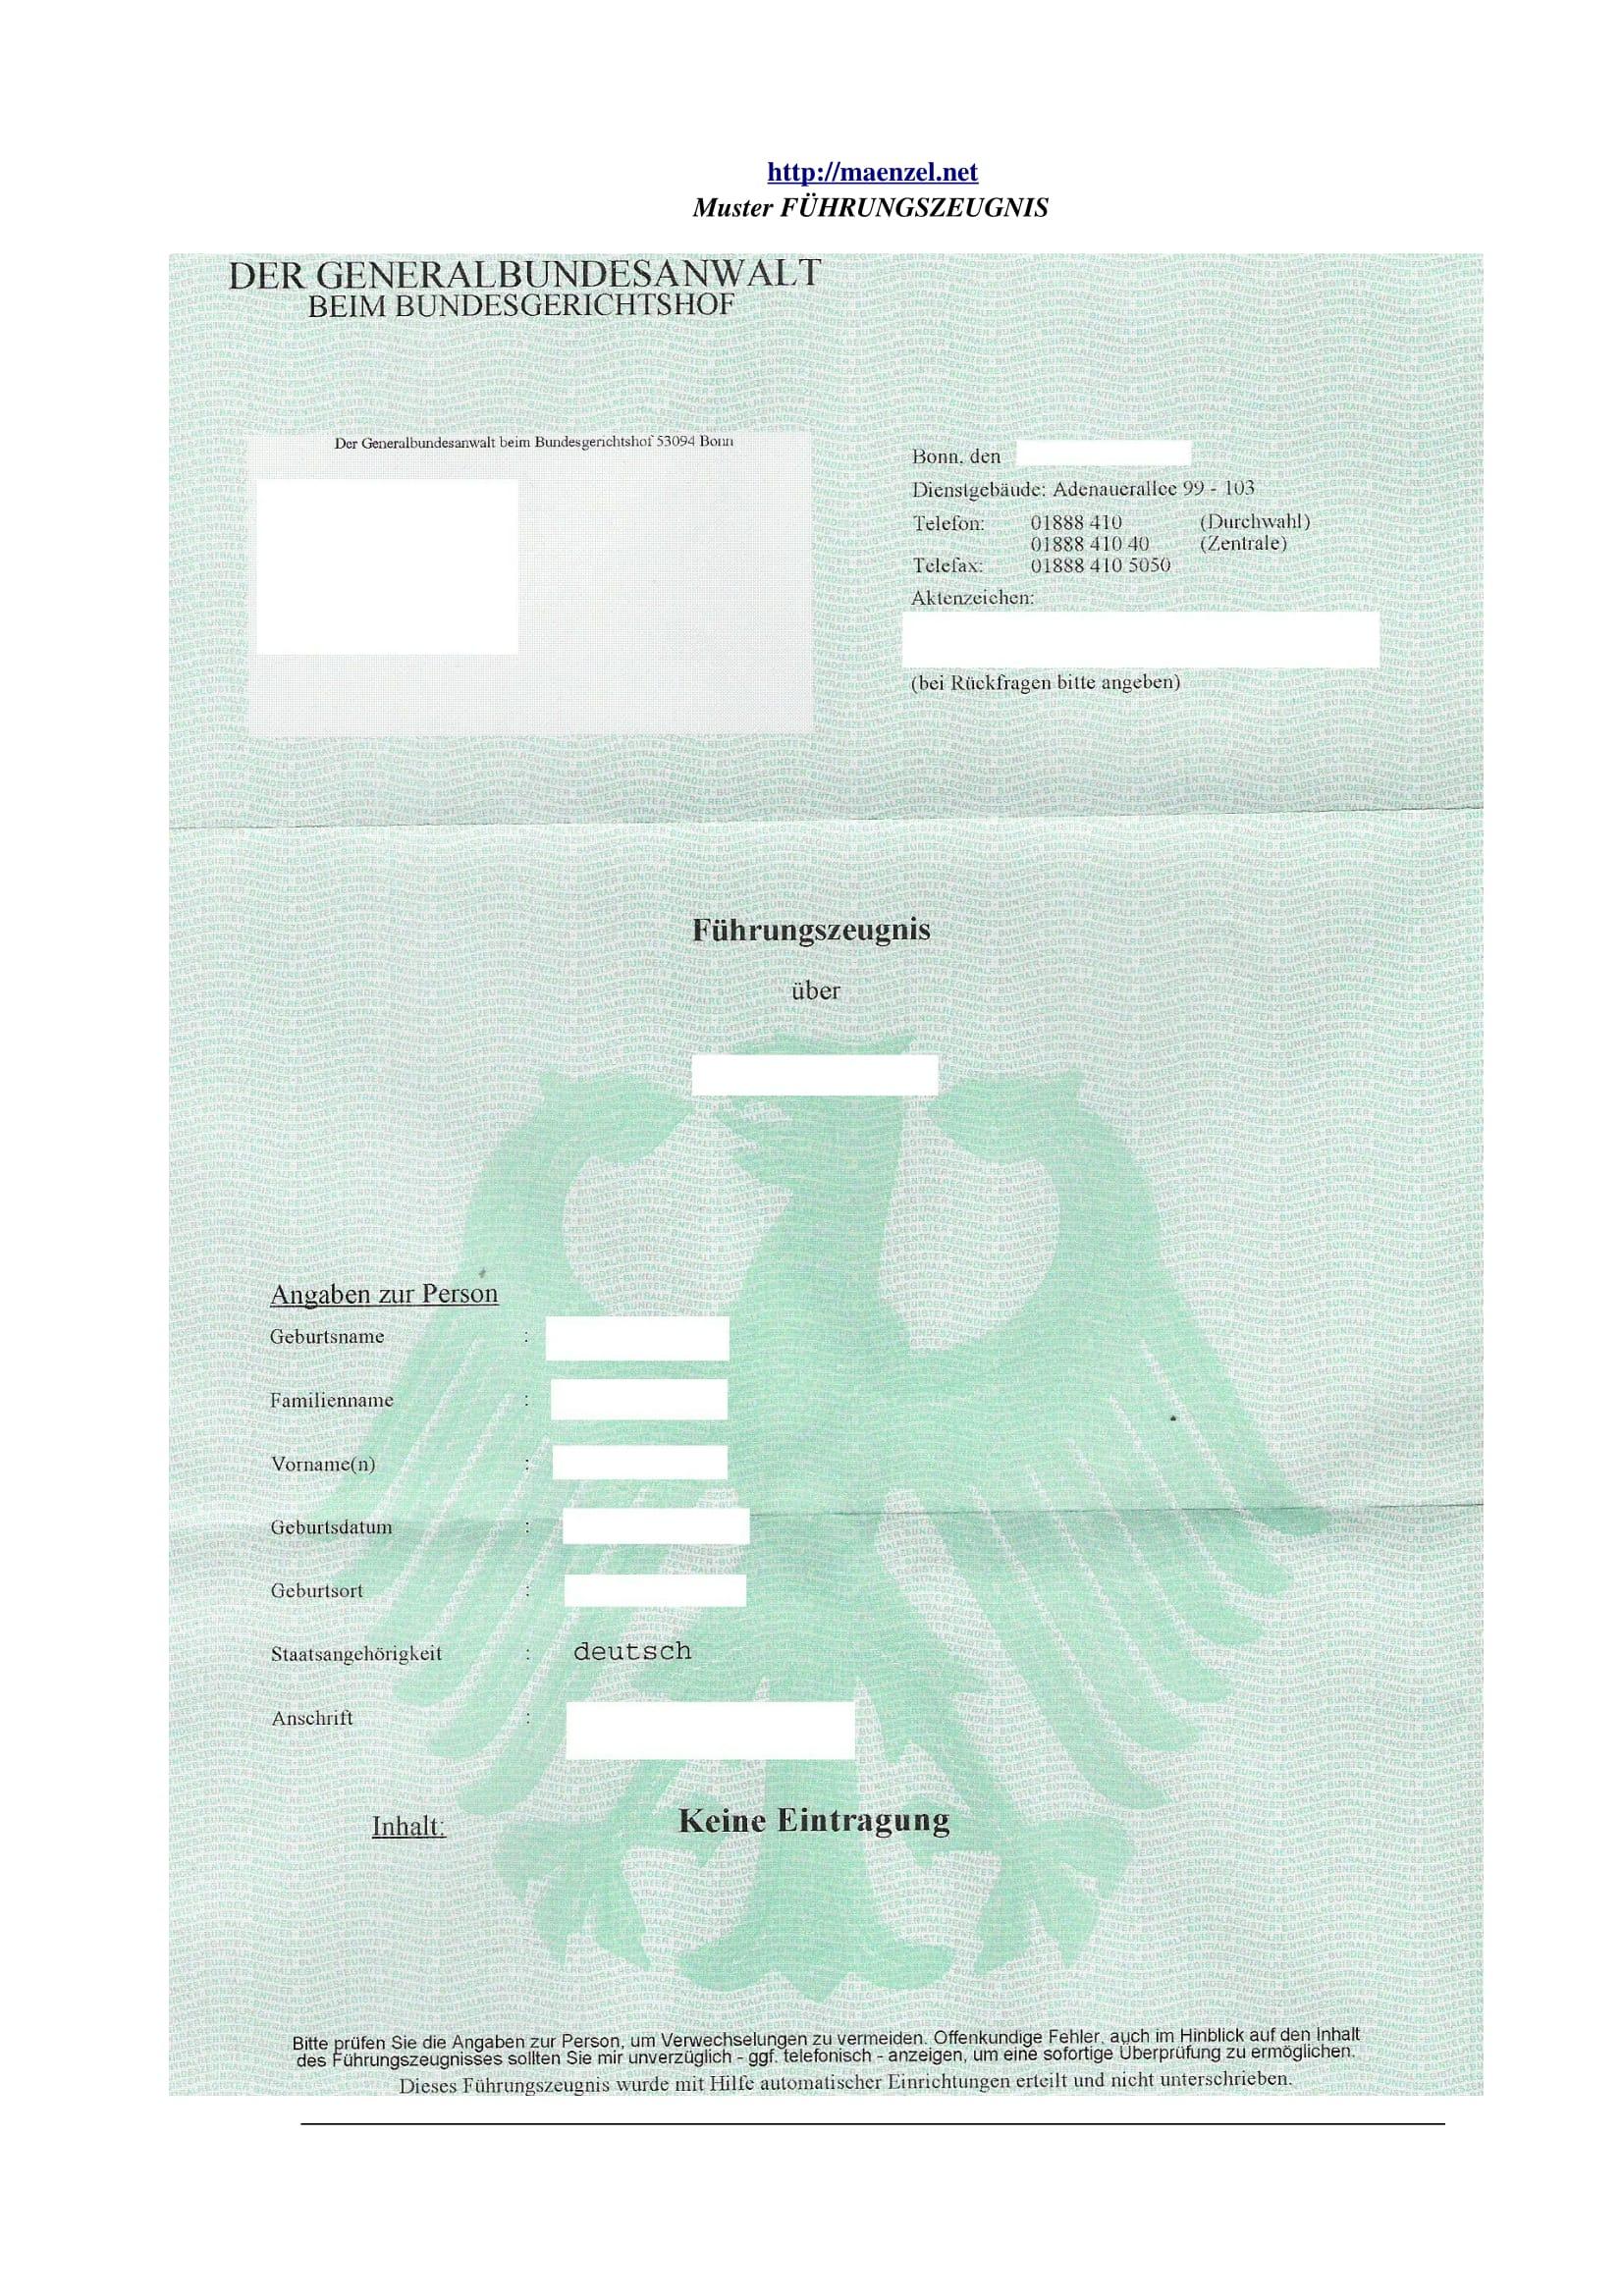 Führungszeugnis-Dtl.-Muster-Original-1